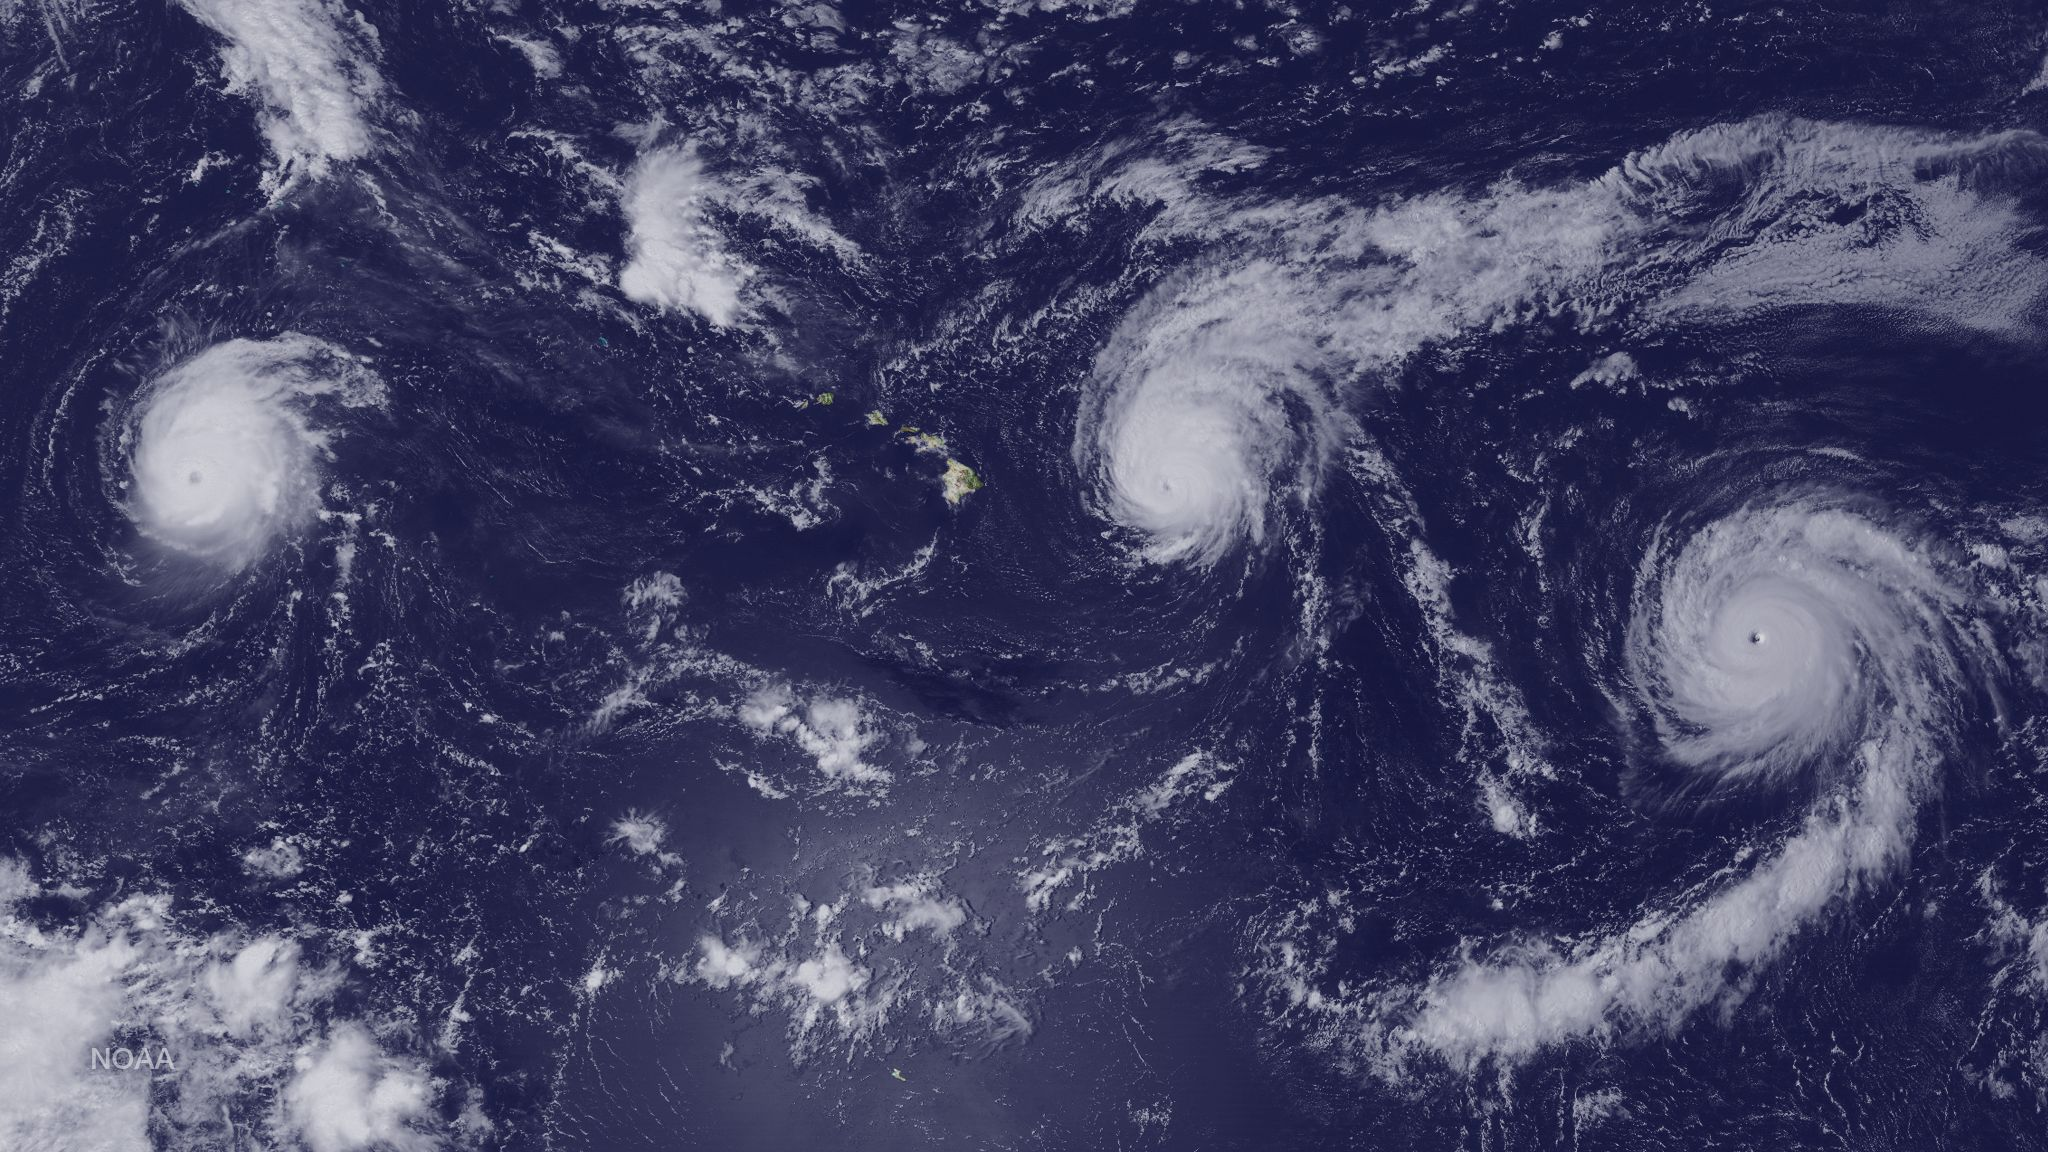 This satellite image taken Aug. 31 shows Hurricanes Kilo (left), Ignacio (center) and Jimena (right) surrounding the Hawaiian